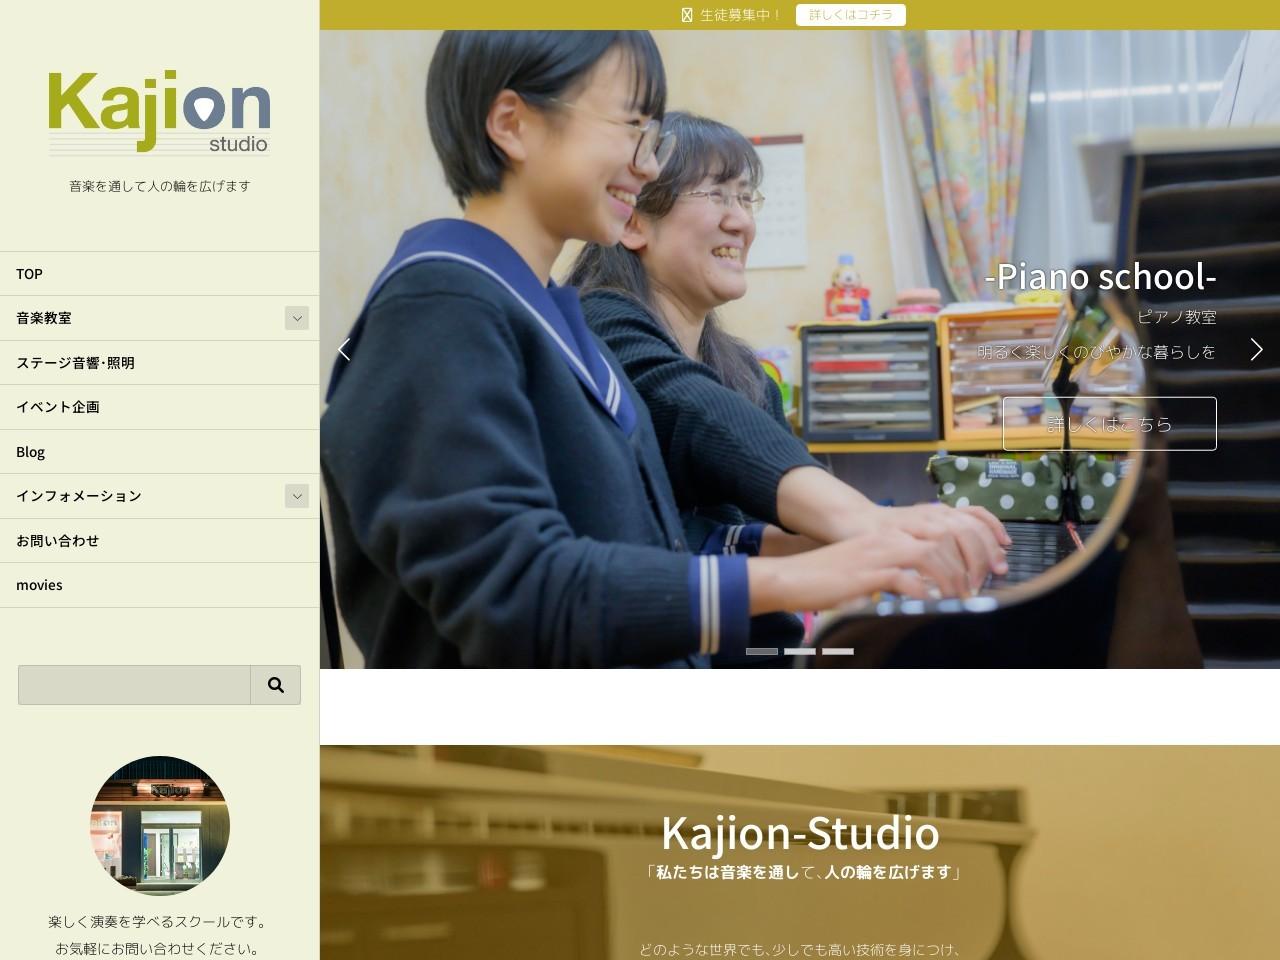 Kajion studioのサムネイル